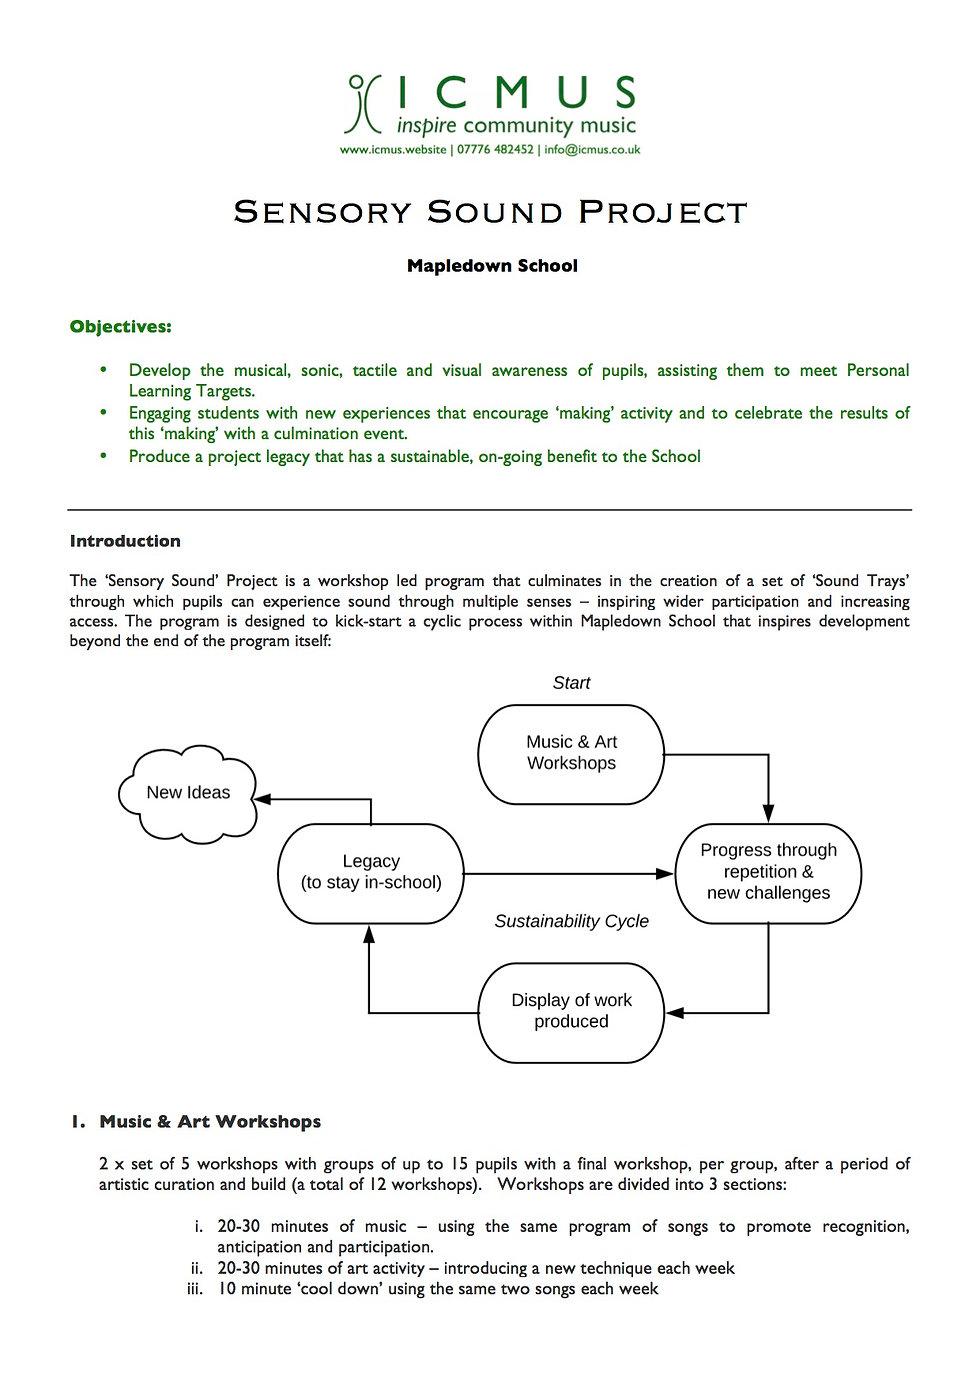 SensorySoundProject_Mapledown_public.jpg